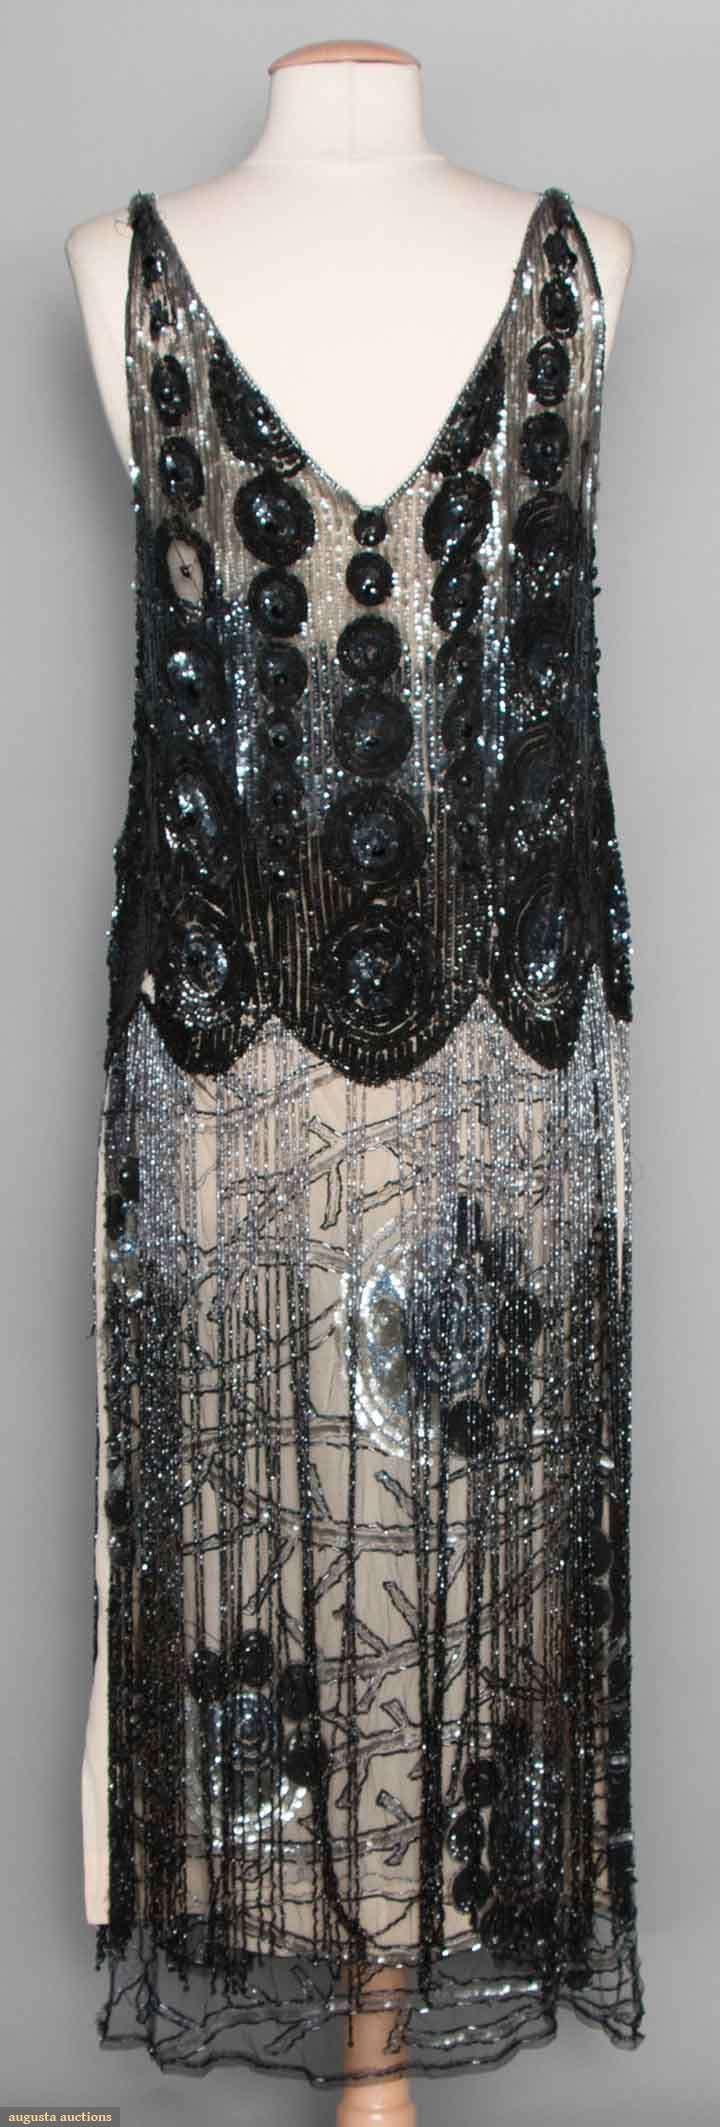 Tabard (image 3) | 1925 | net, gunmetal sequins | Augusta Auctions | November 12, 2014/Lot 199